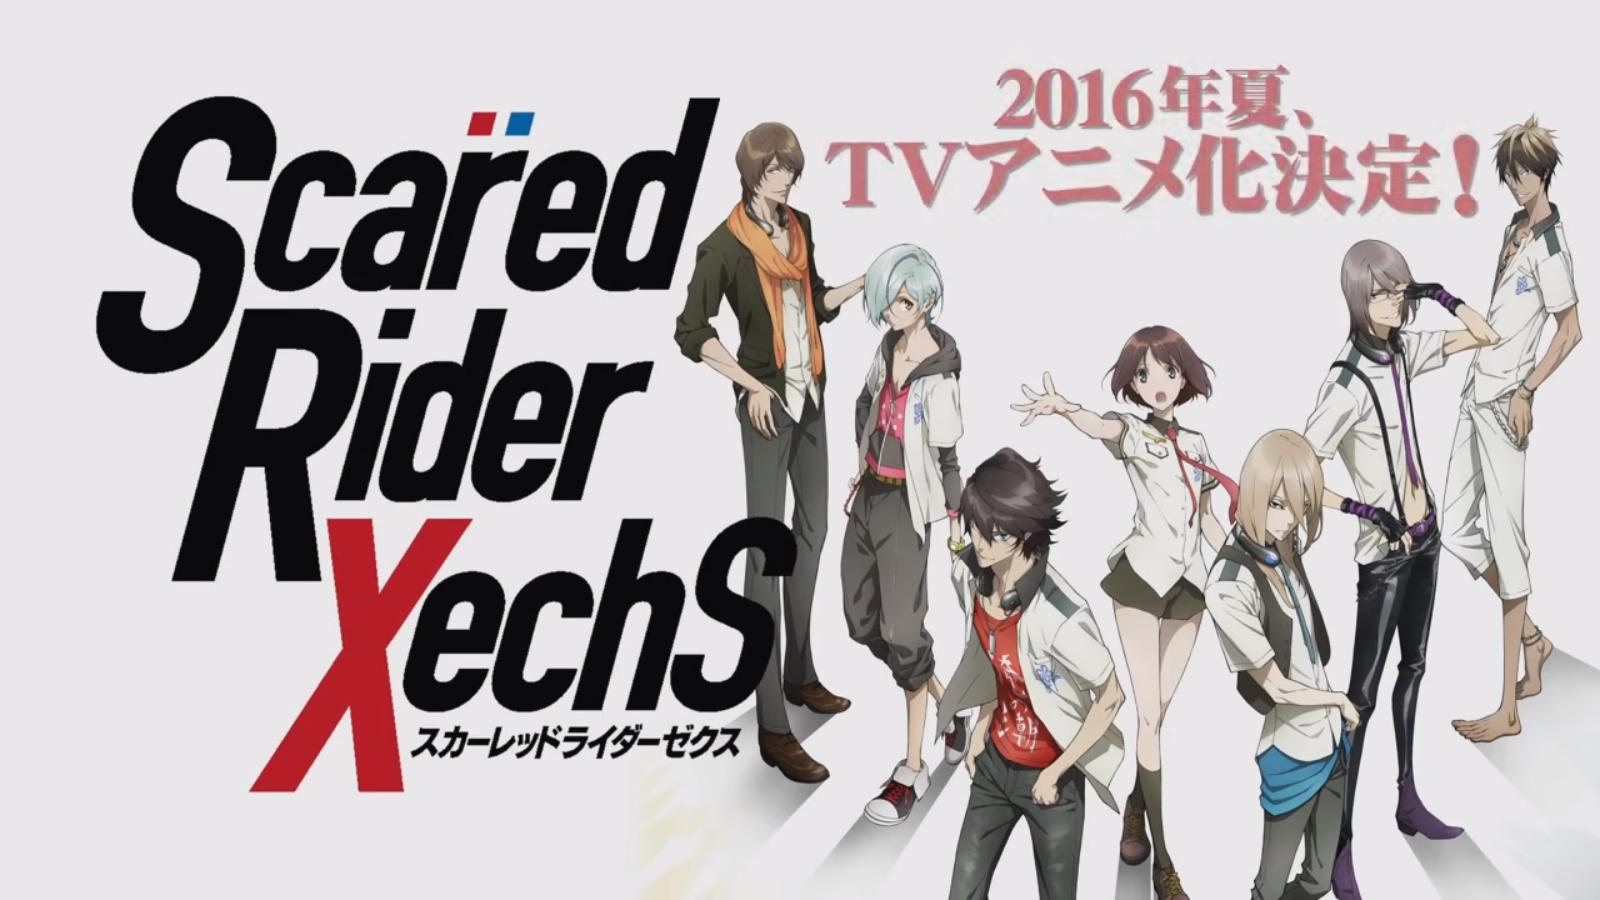 Scared Rider Xechs2